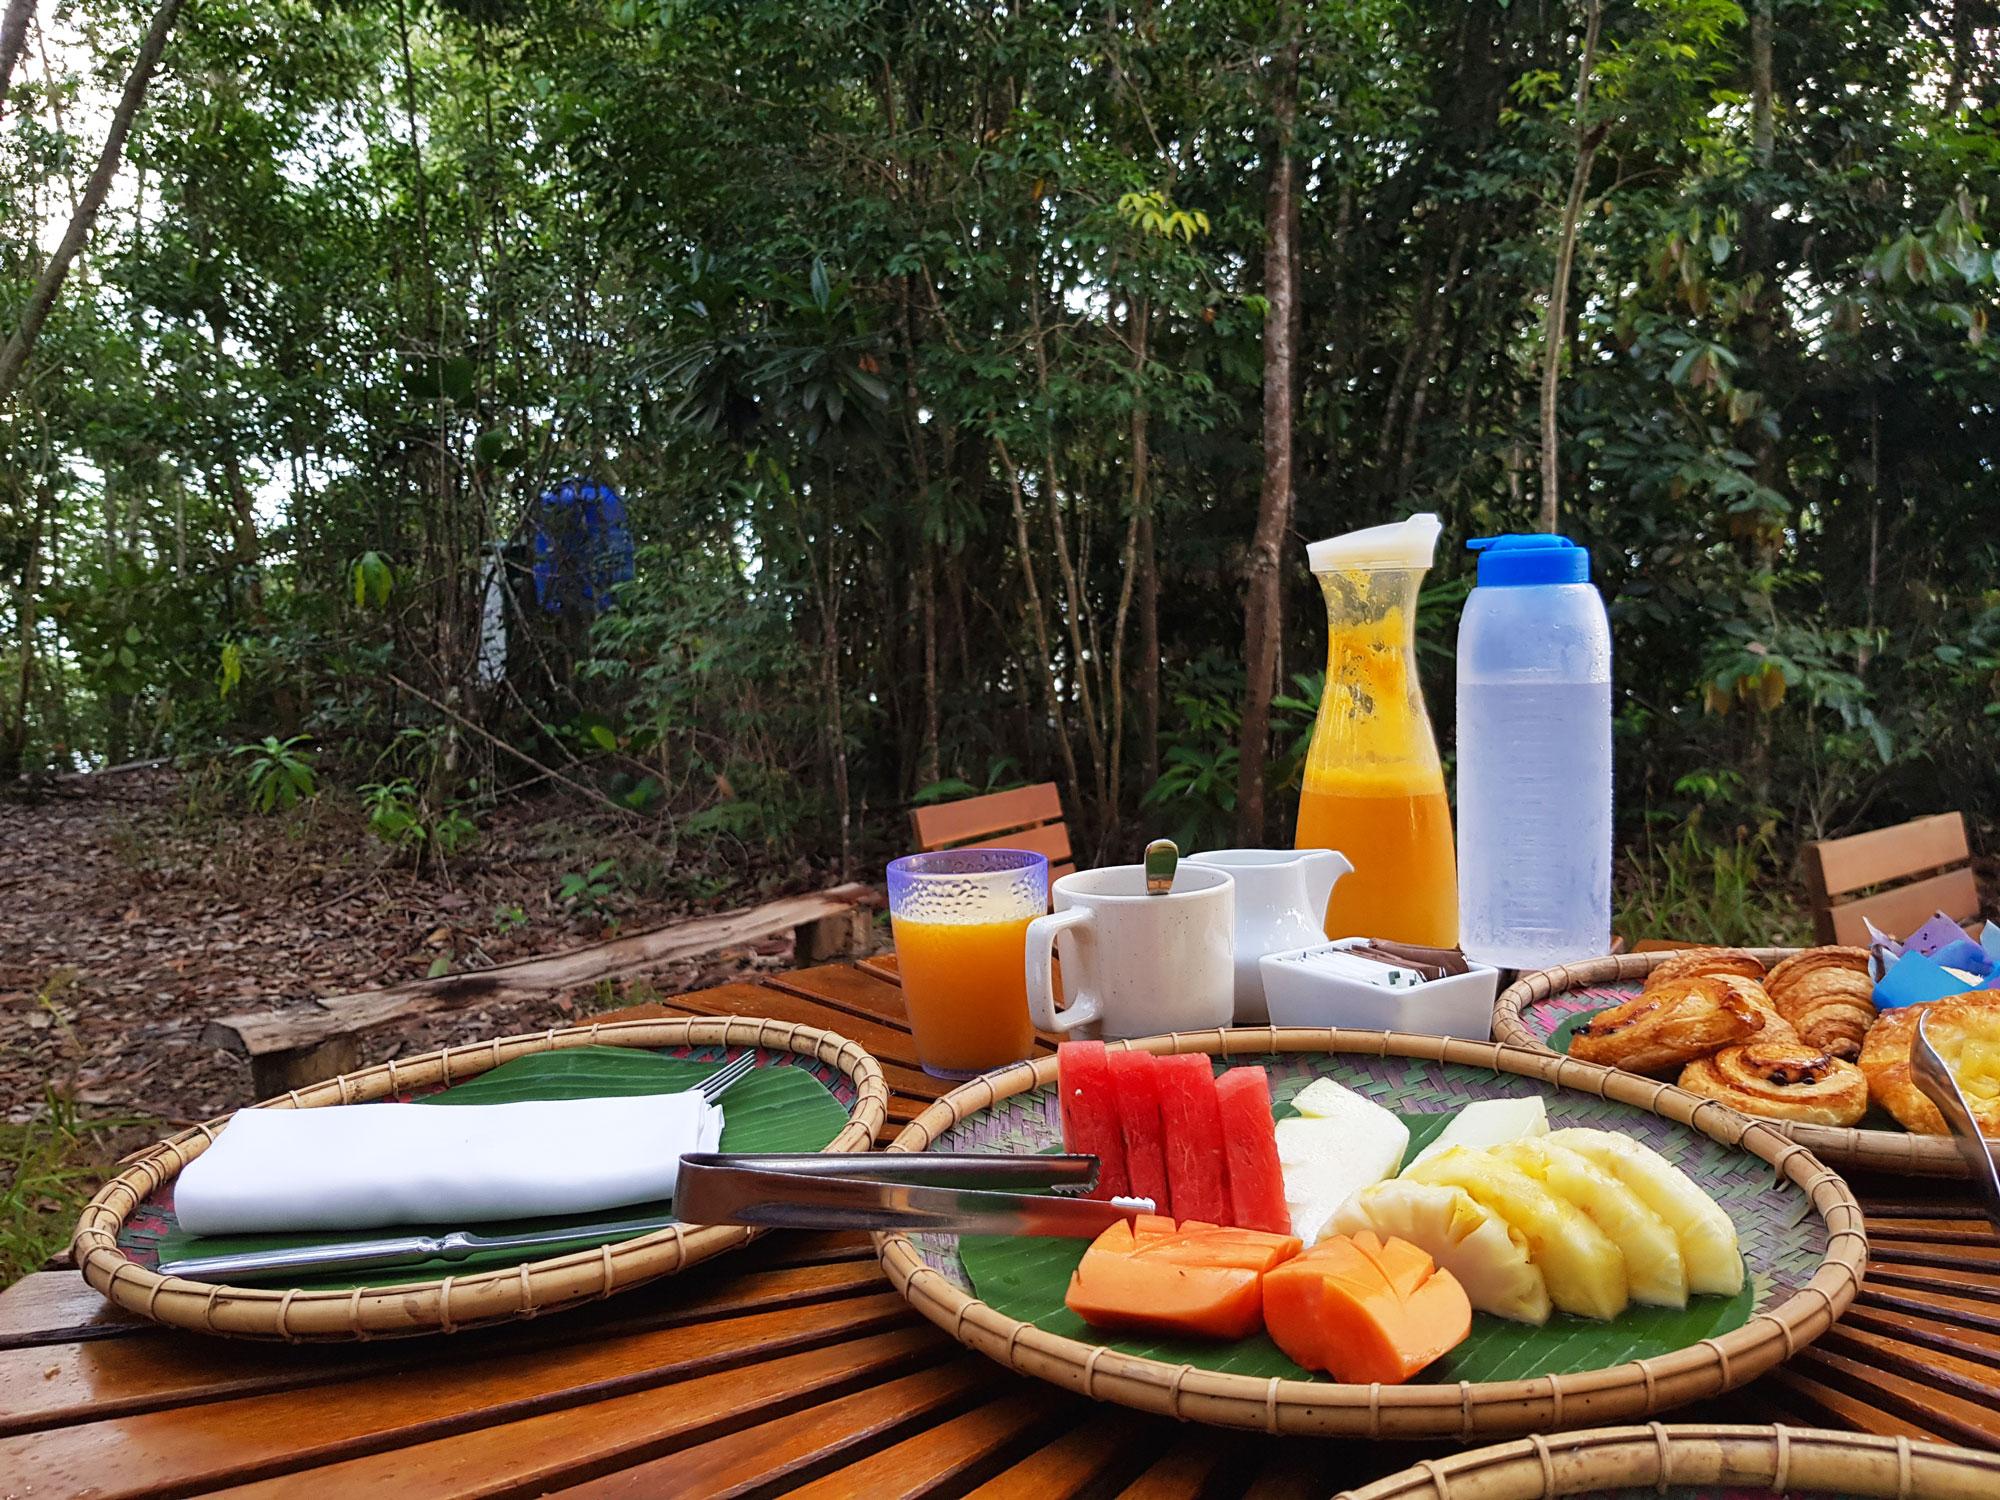 rasaria_reserve_breakfast.jpg